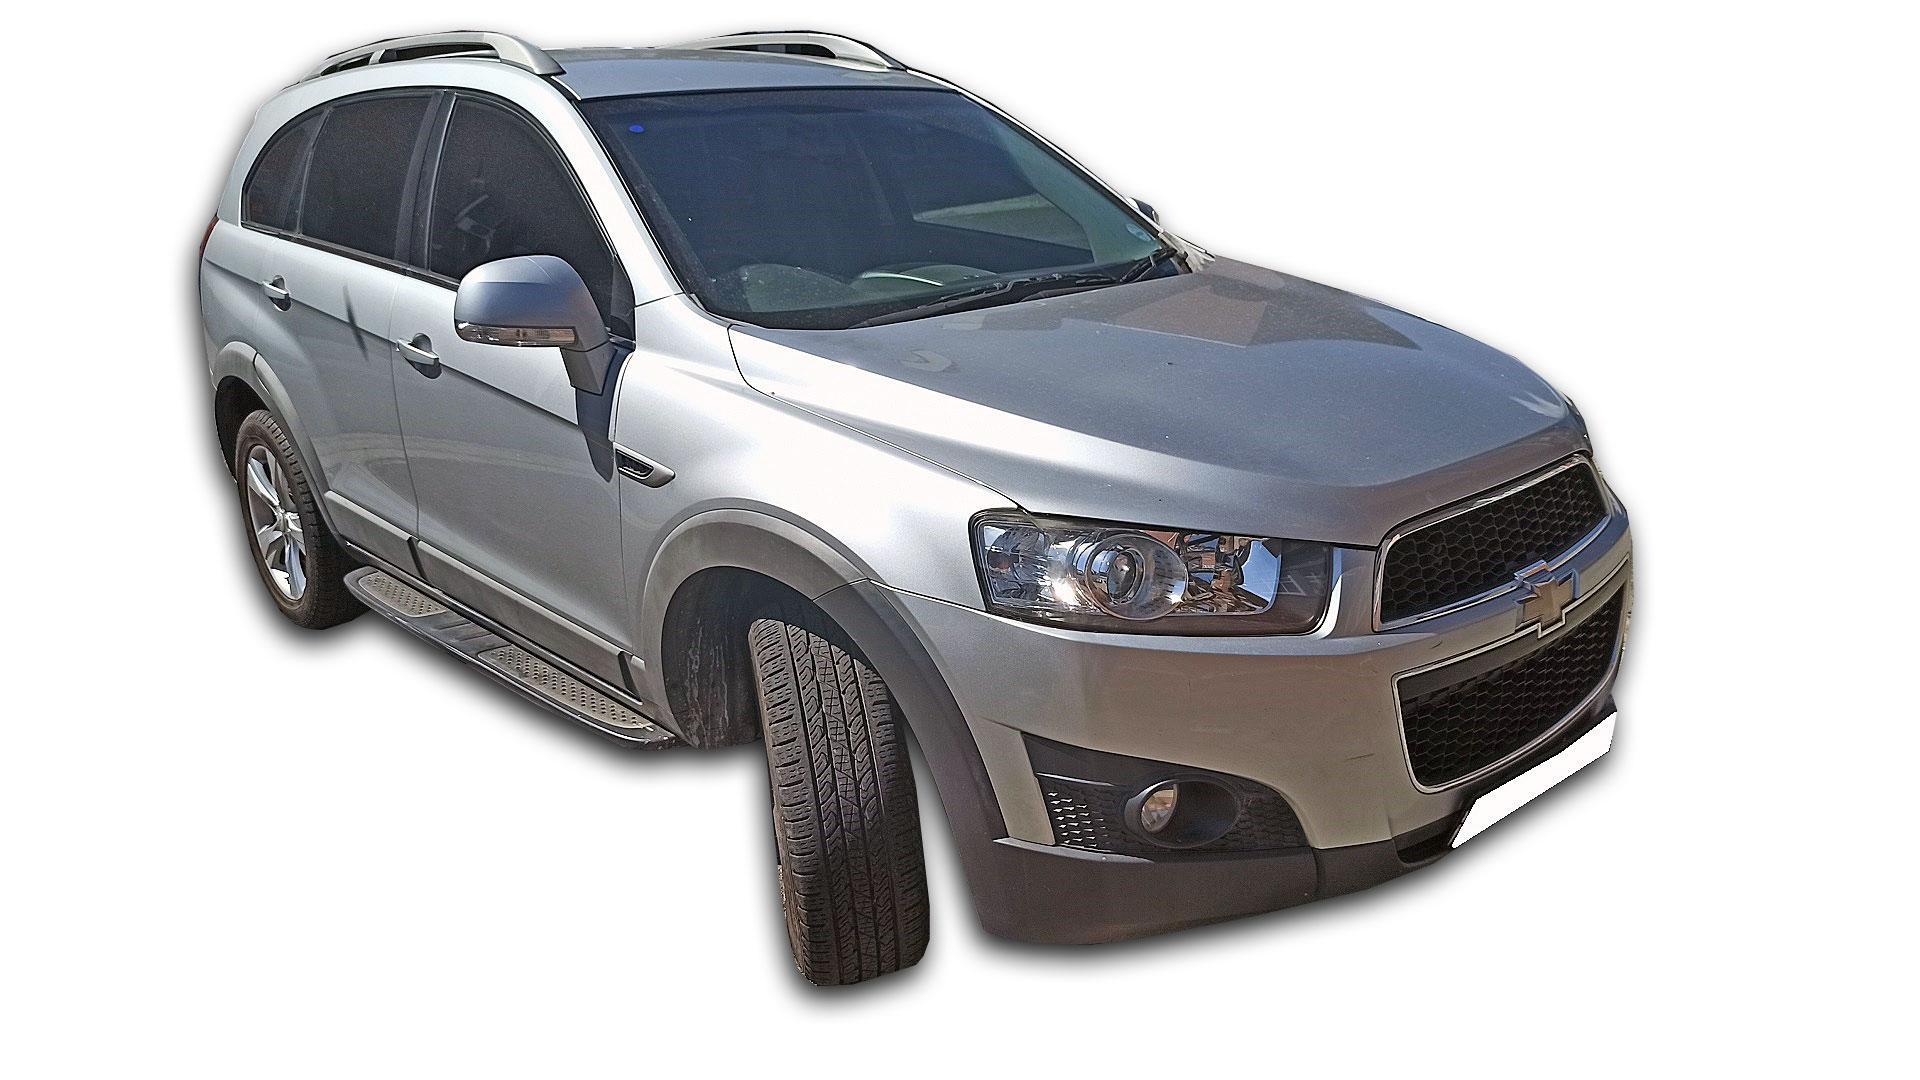 Chevrolet Captiva 2.4 LT 4X4